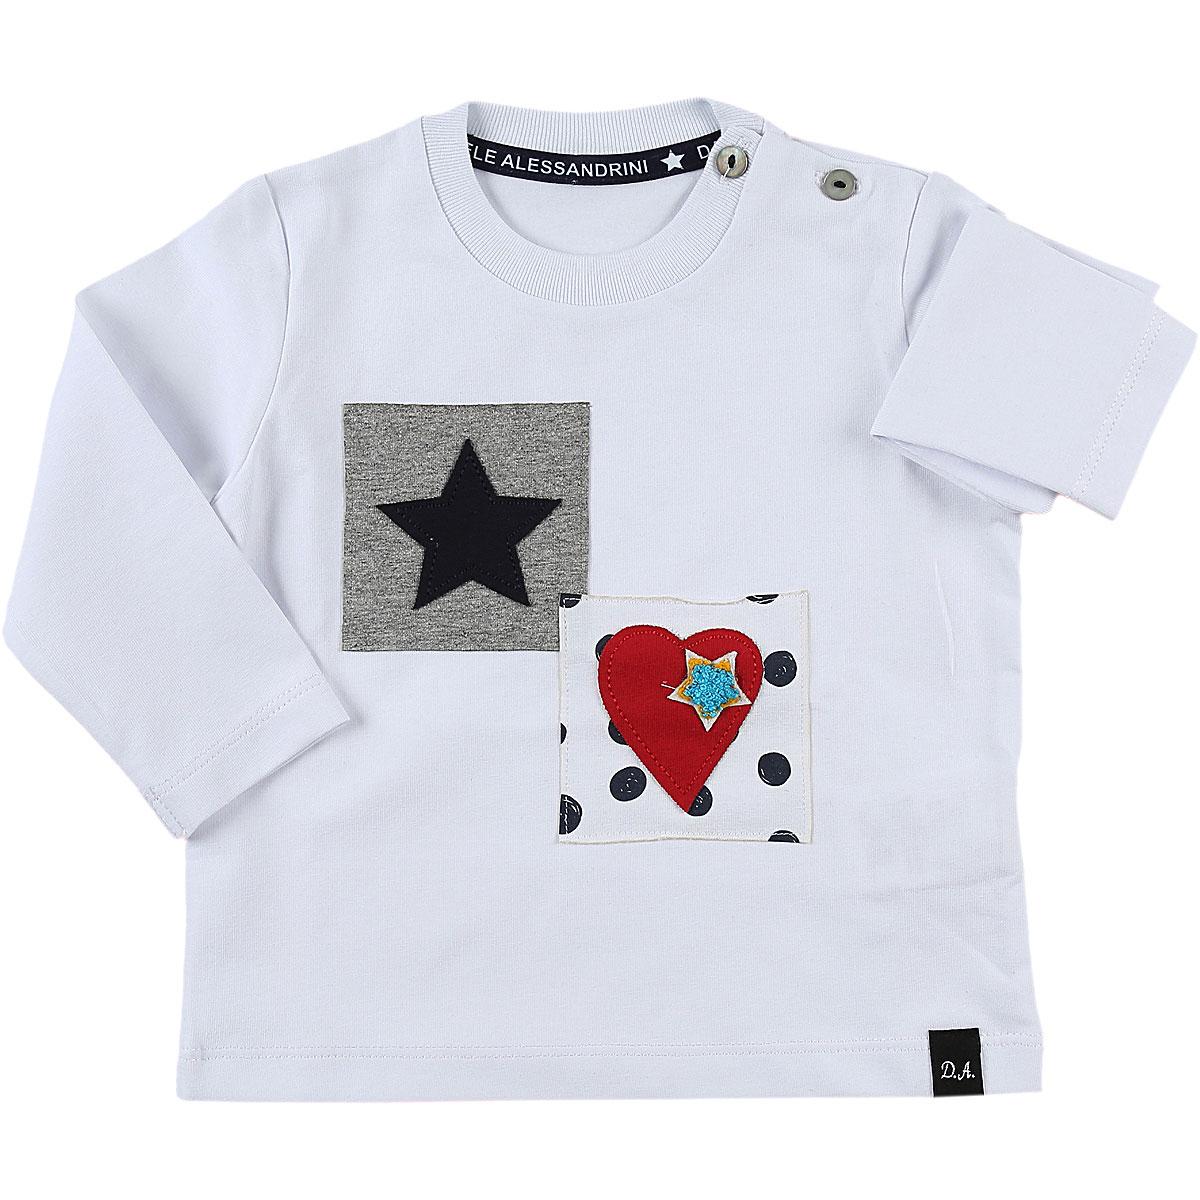 Daniele Alessandrini Baby T-Shirt for Boys On Sale, White, Cotton, 2019, 18M 9M